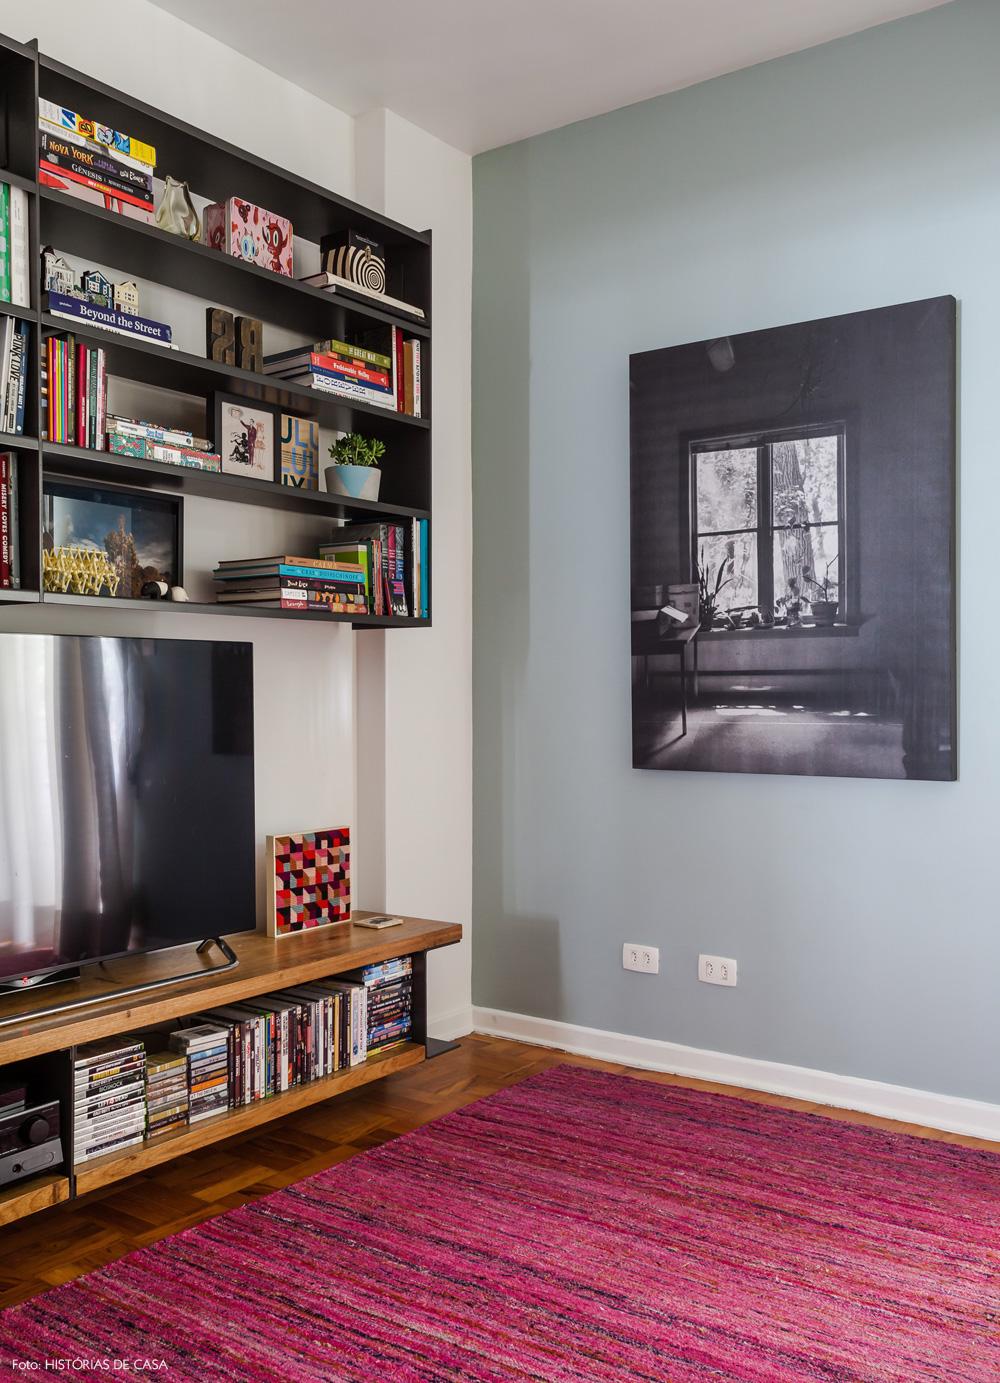 18-decoracao-sala-de-tv-tapete-rosa-estante-preta